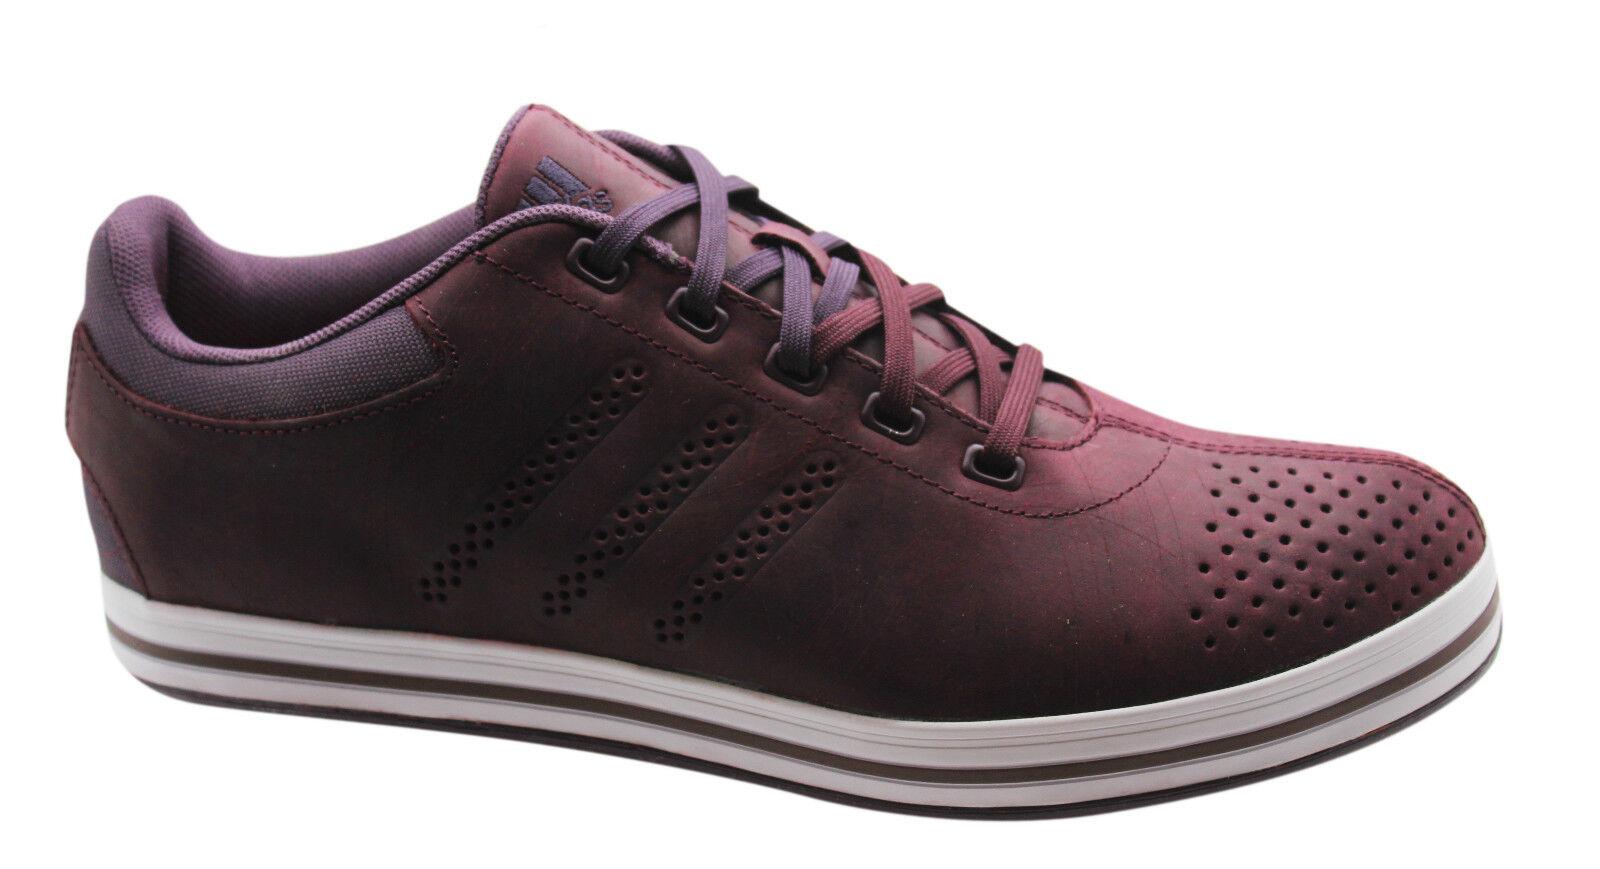 Adidas Perforhommece Sportive Zeitfrei paniers Homme Chaussures Basses en Cuir M18049 D91